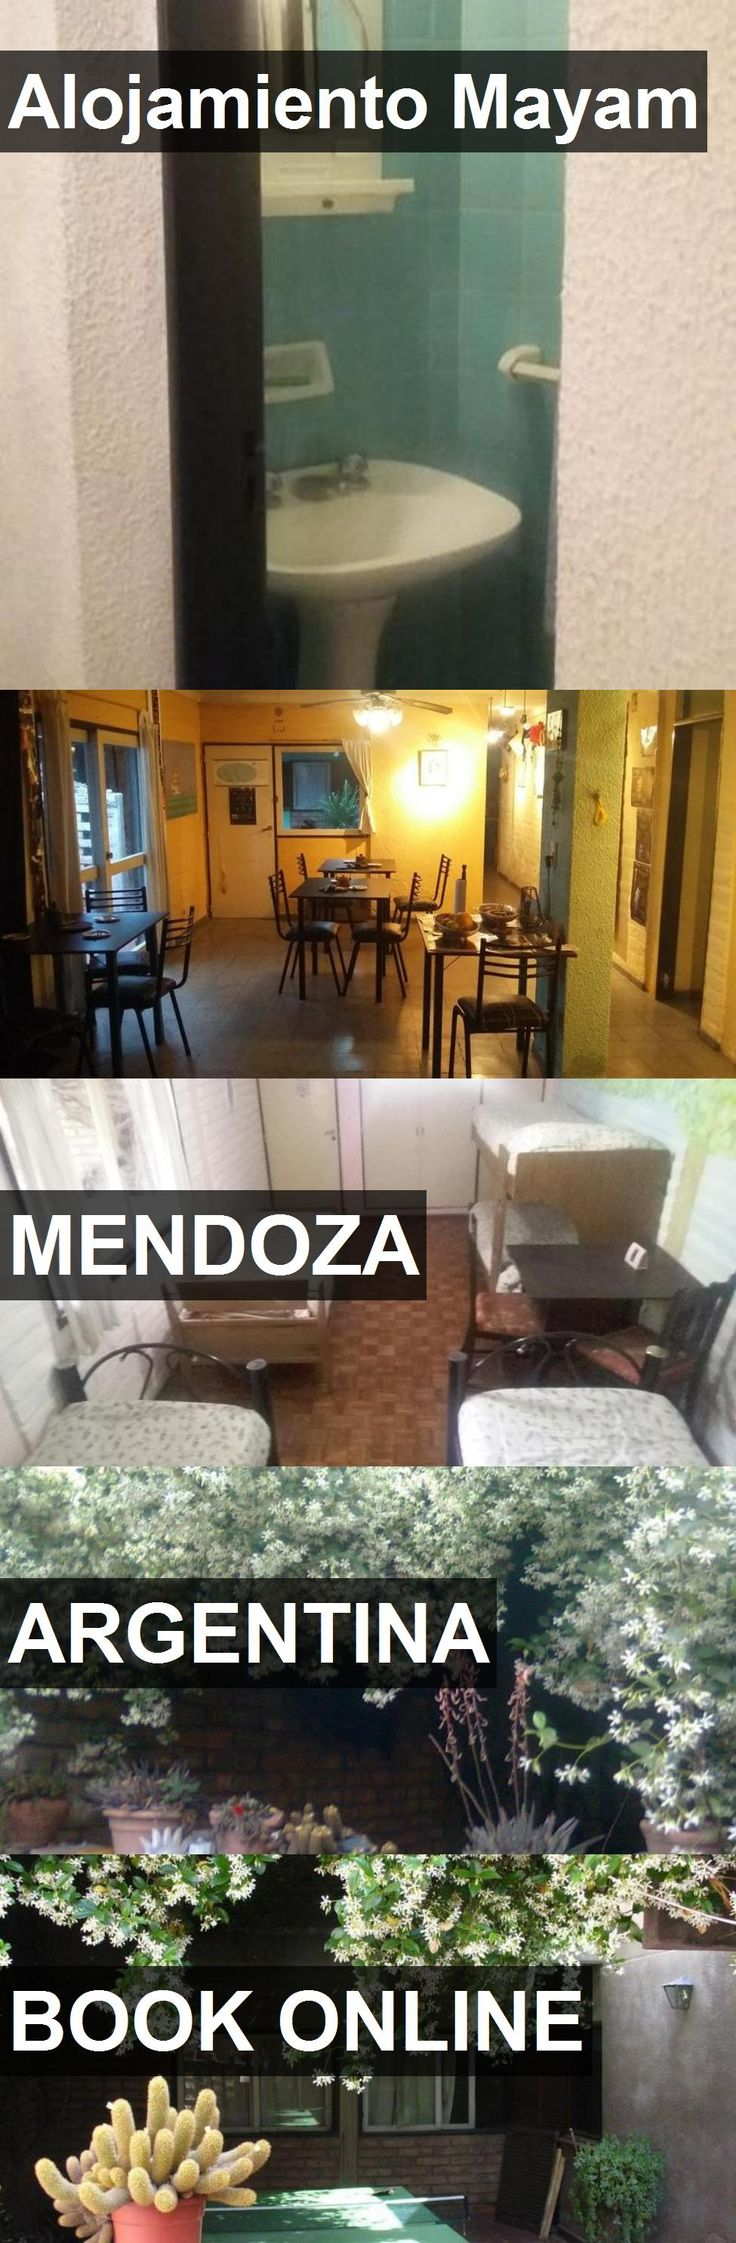 Hotel Alojamiento Mayam in Mendoza, Argentina. For more information, photos, reviews and best prices please follow the link. #Argentina #Mendoza #AlojamientoMayam #hotel #travel #vacation